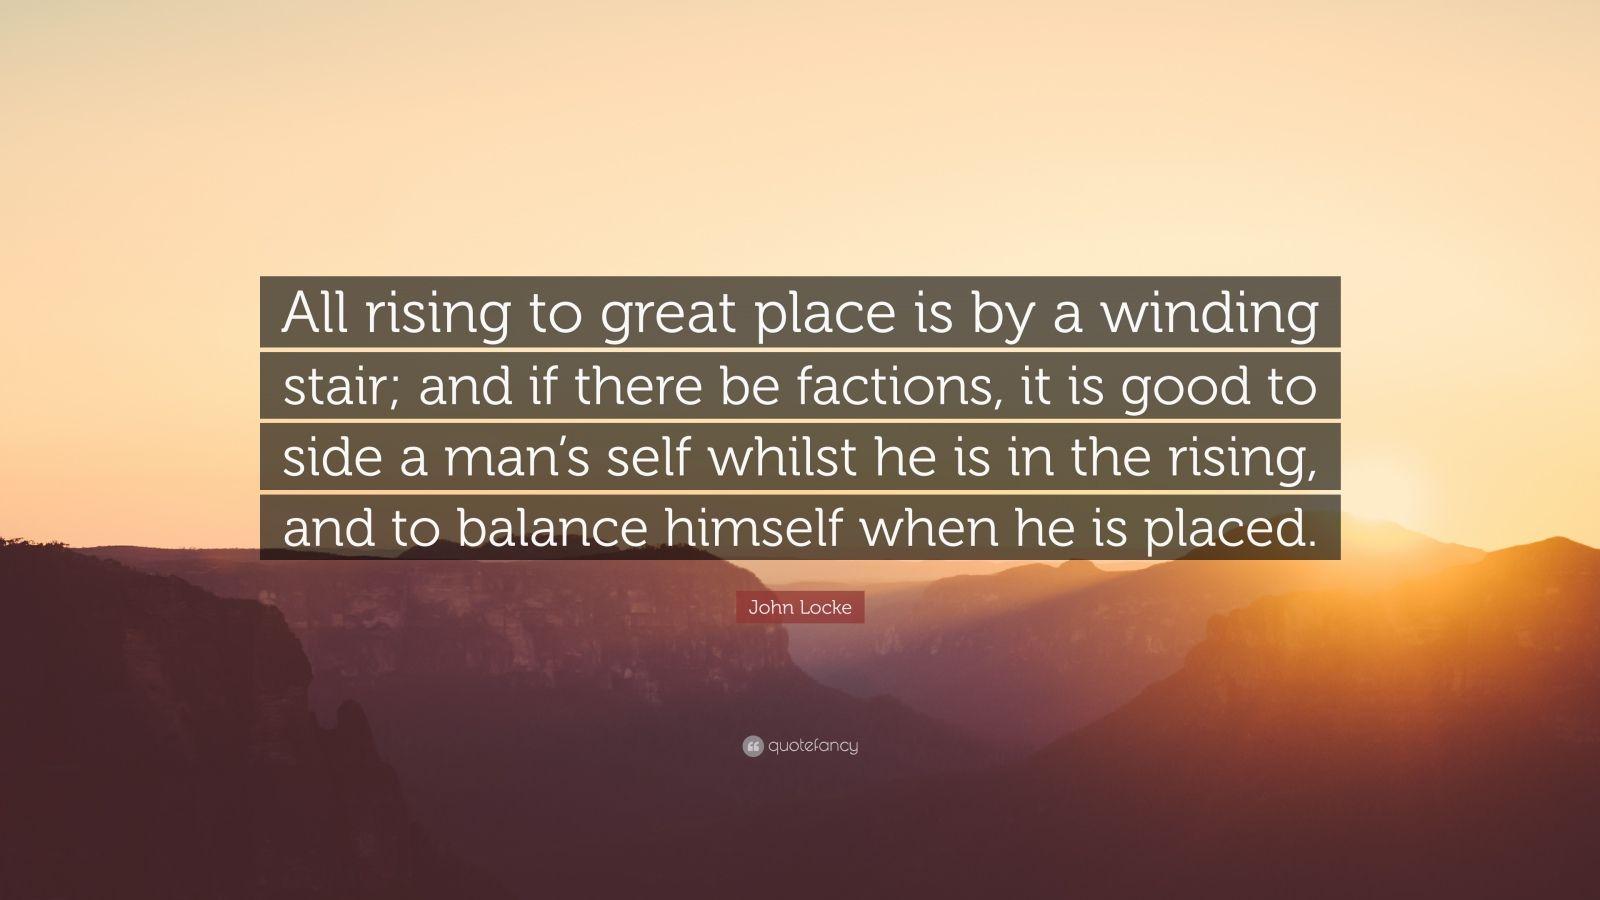 John Locke Quotes 100 Wallpapers Quotefancy